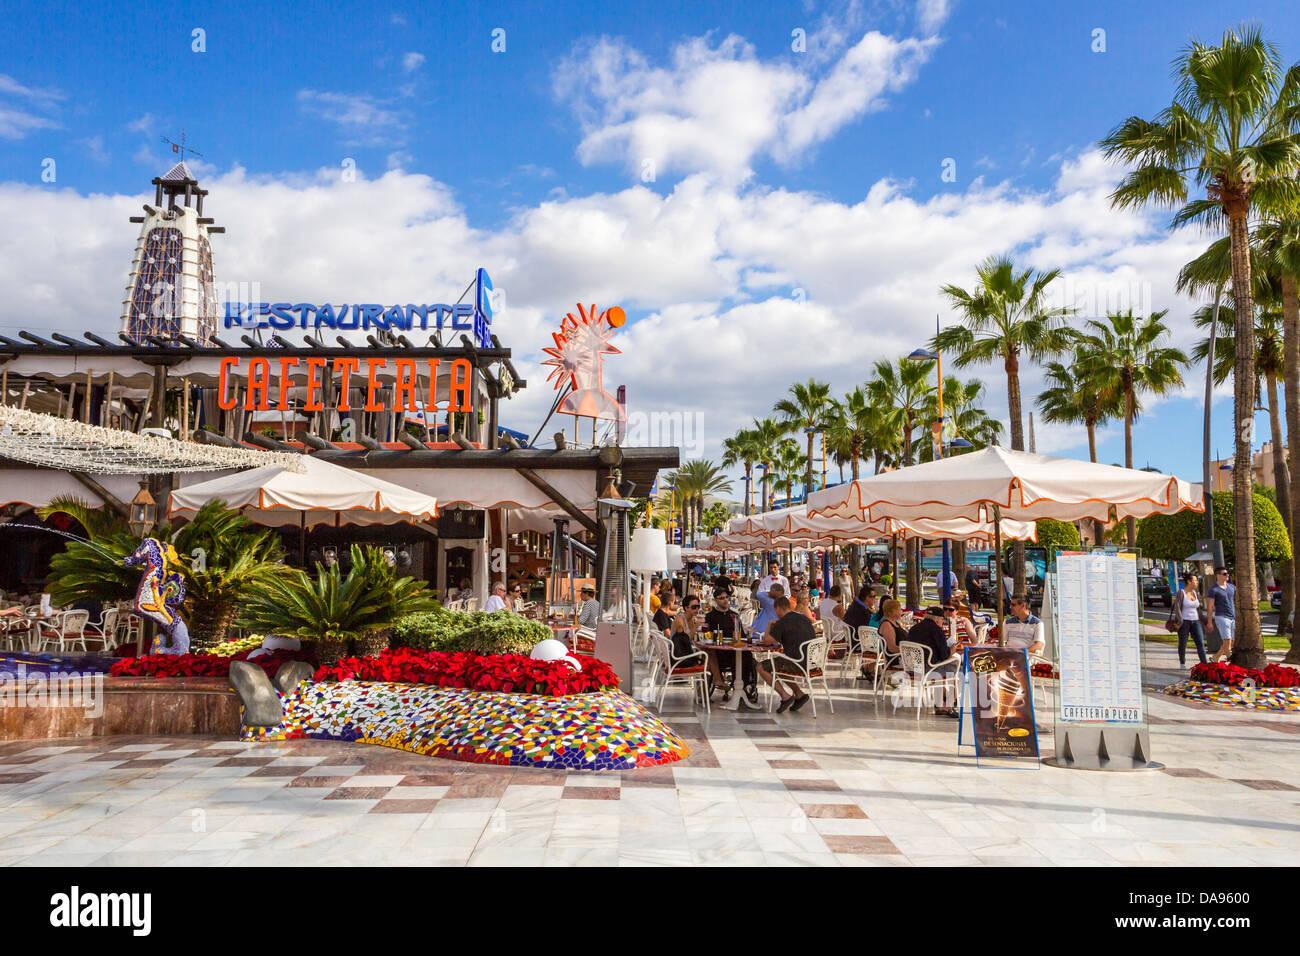 Cafe terrace, Spain, Europe, Canary Islands, Playa las Americas, Tenerife Island, Tenerife, Teneriffa, avenue, clean, - Stock Image